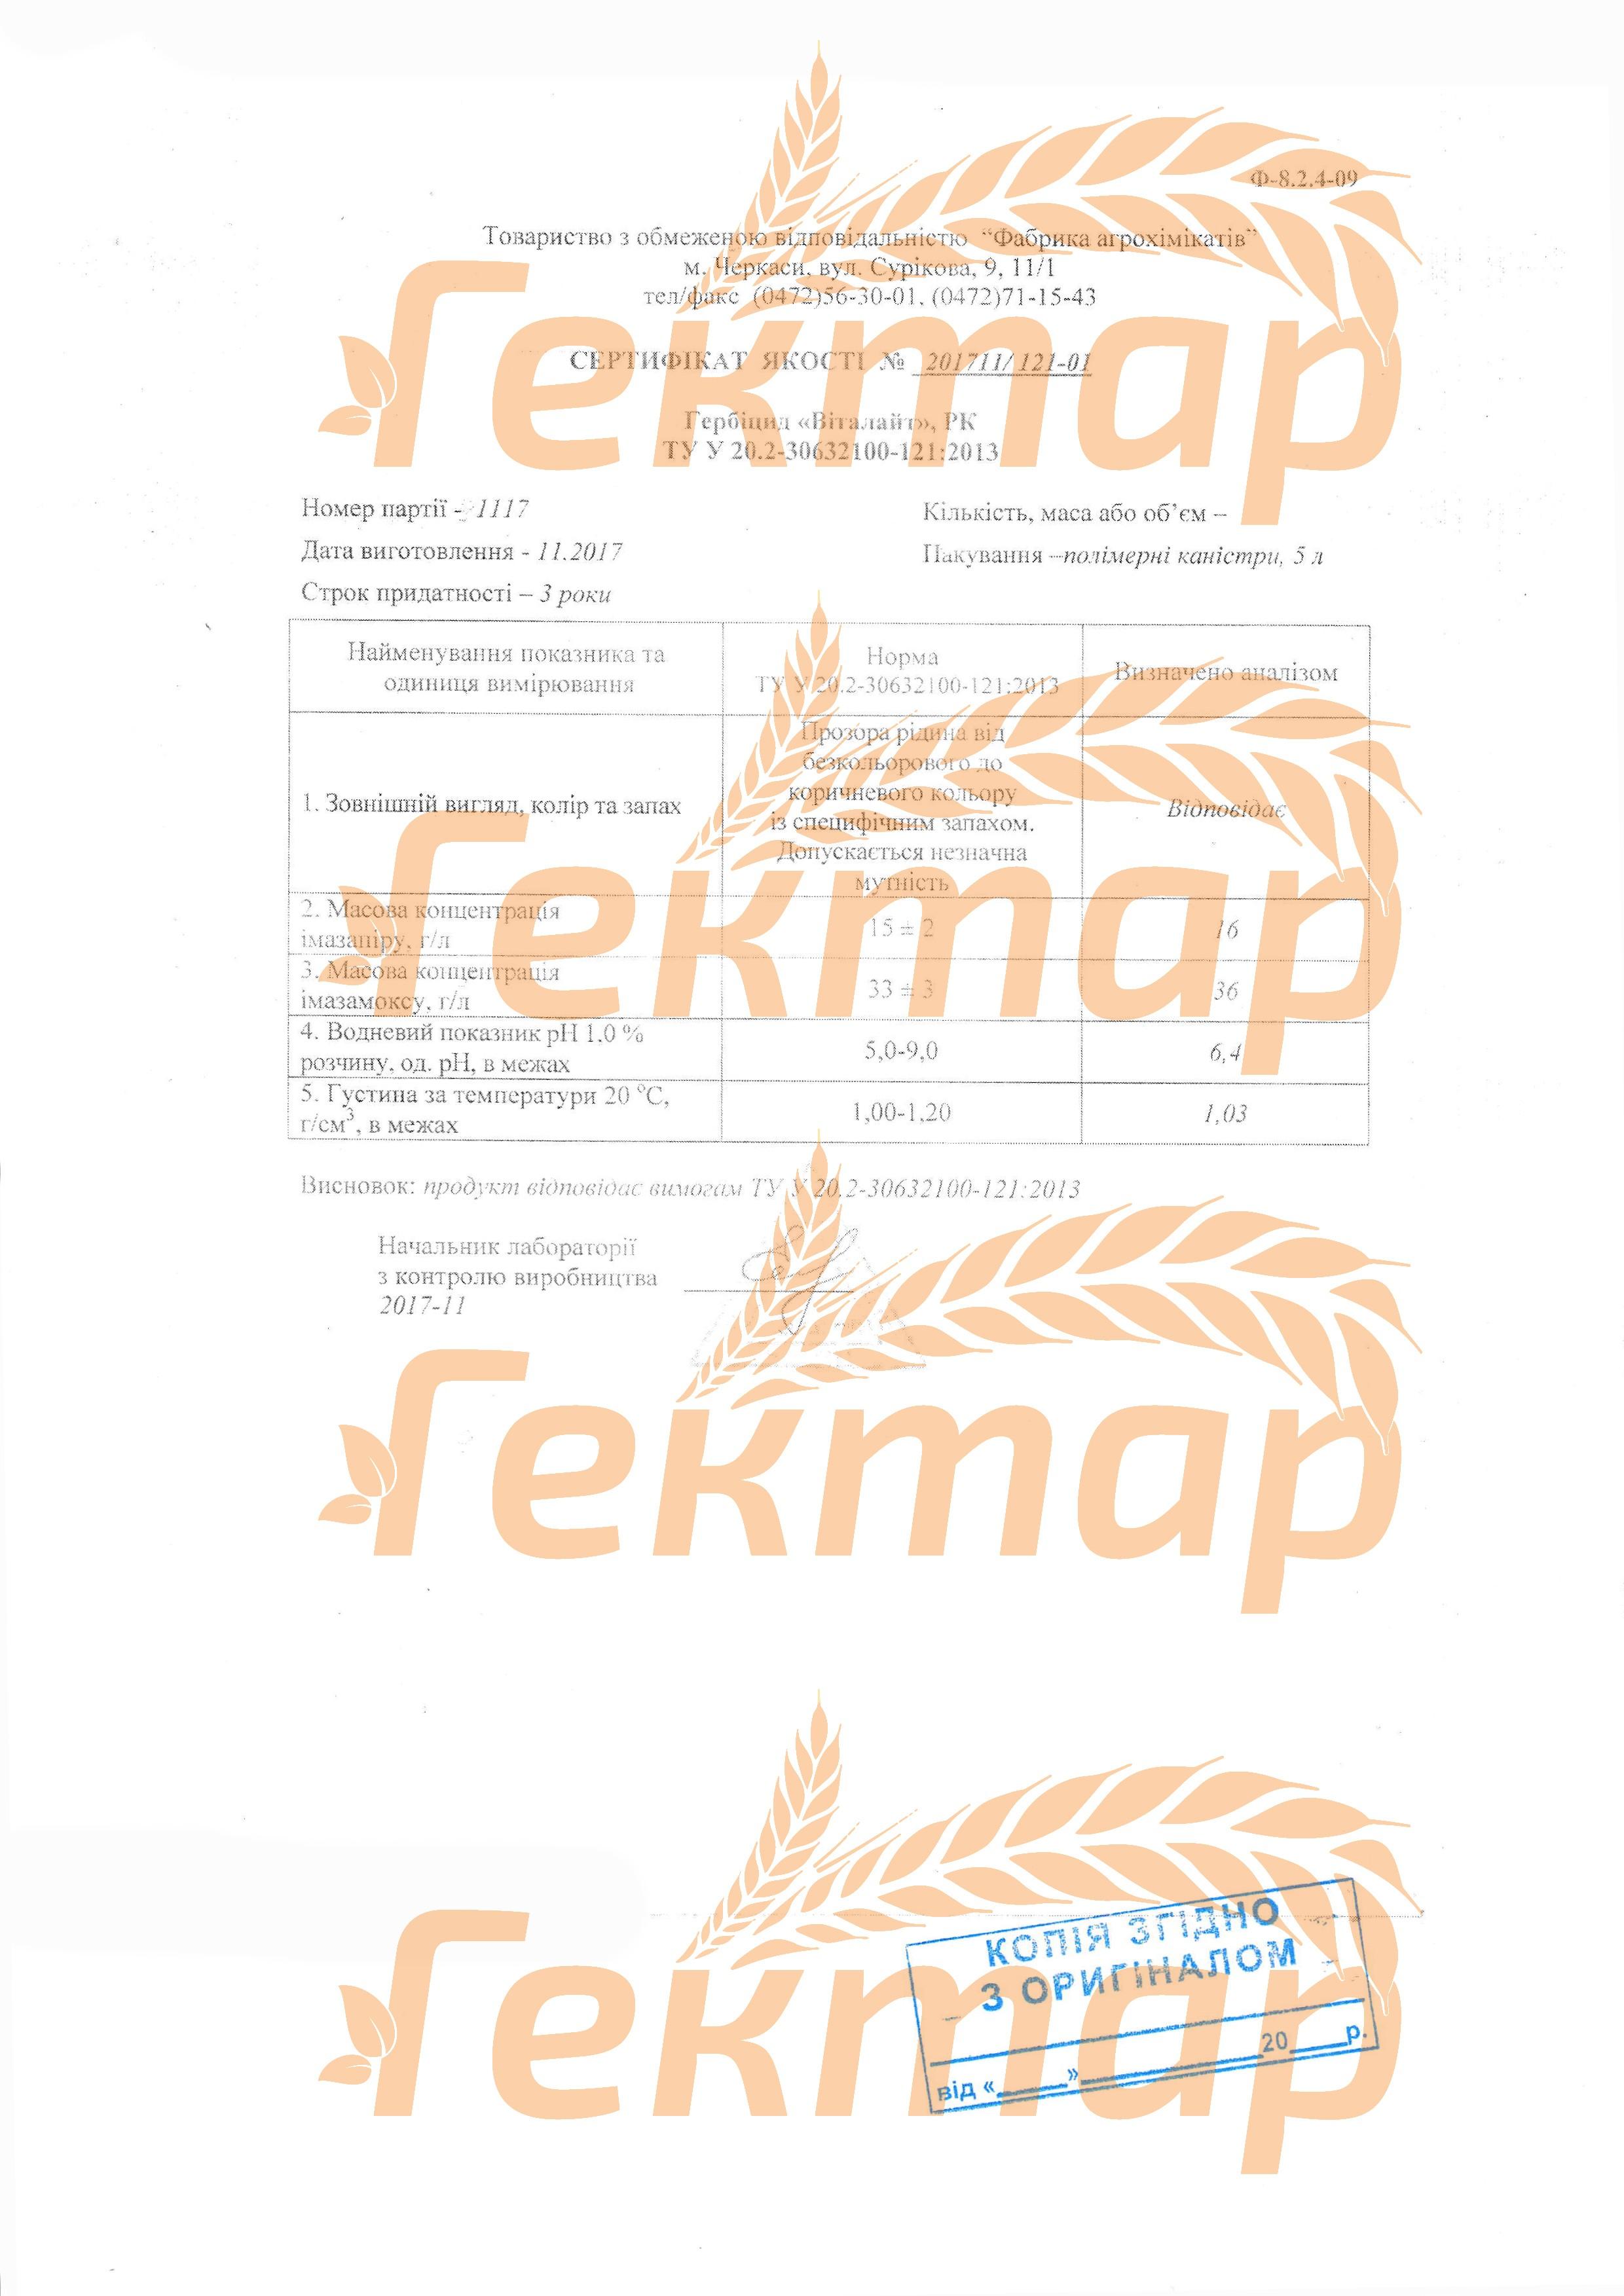 https://hectare.ua/upload/5ab363b58794d.jpg